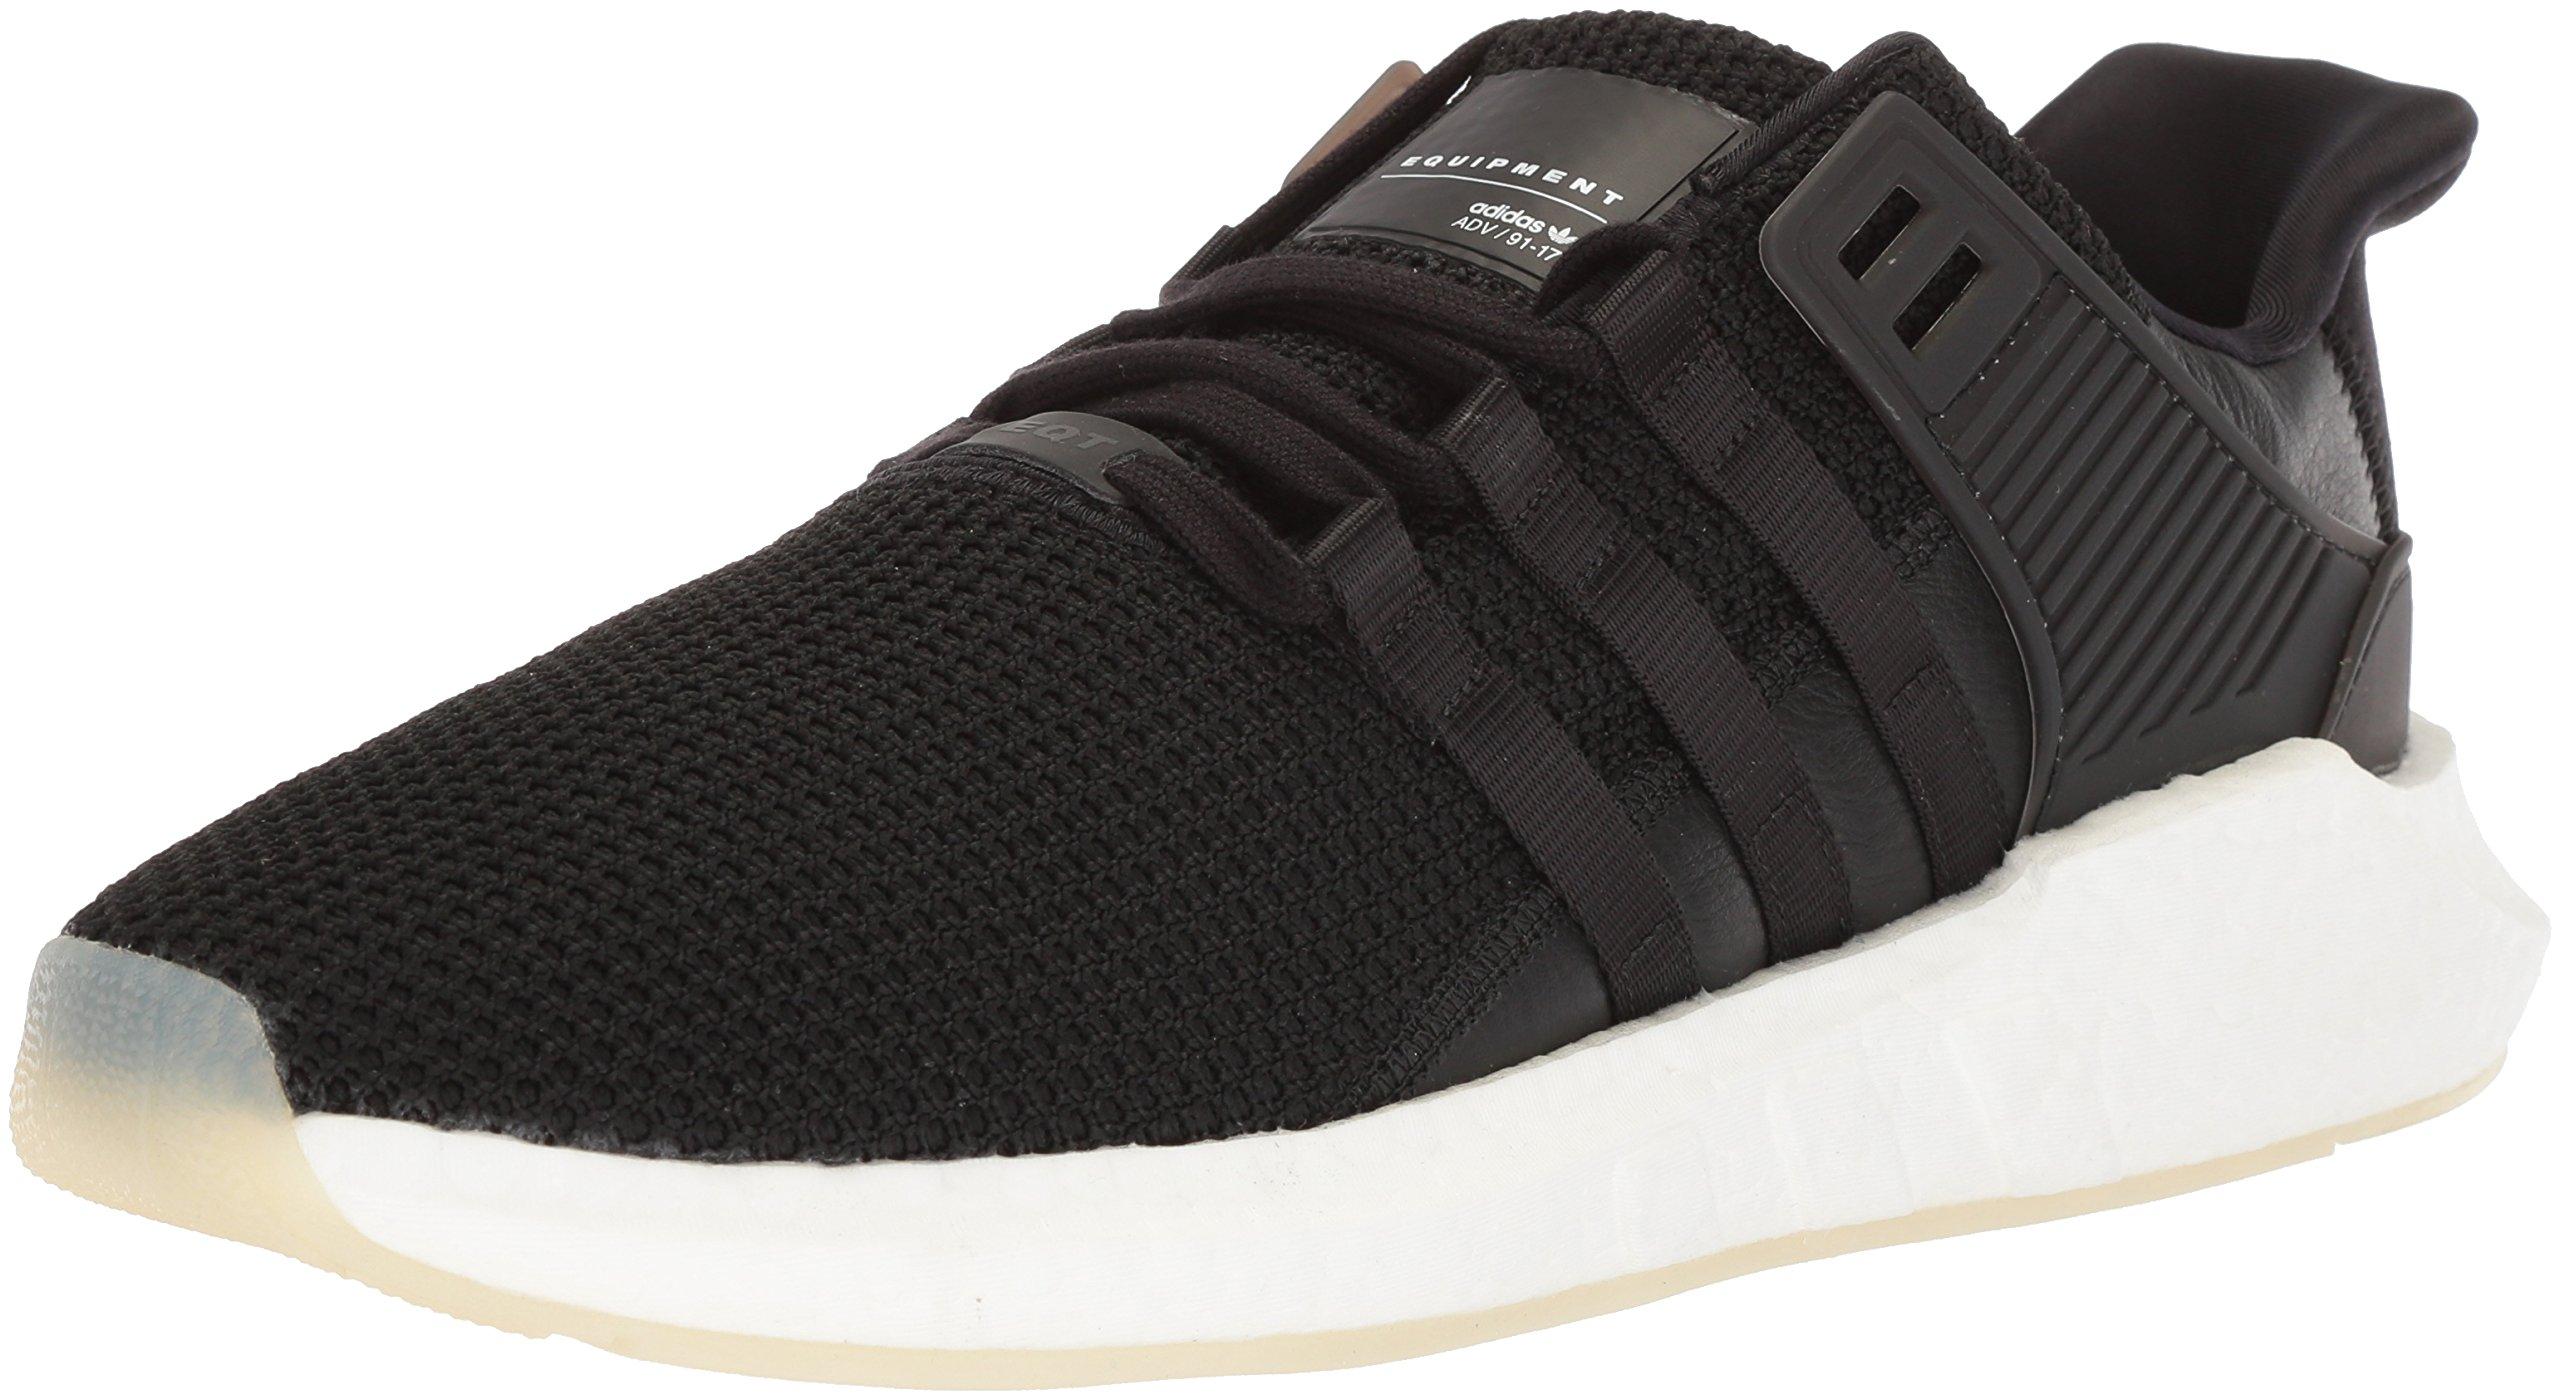 adidas Originals Men's EQT Support 93/17 Running Shoe, Core Black/Core Black/White, 11 M US